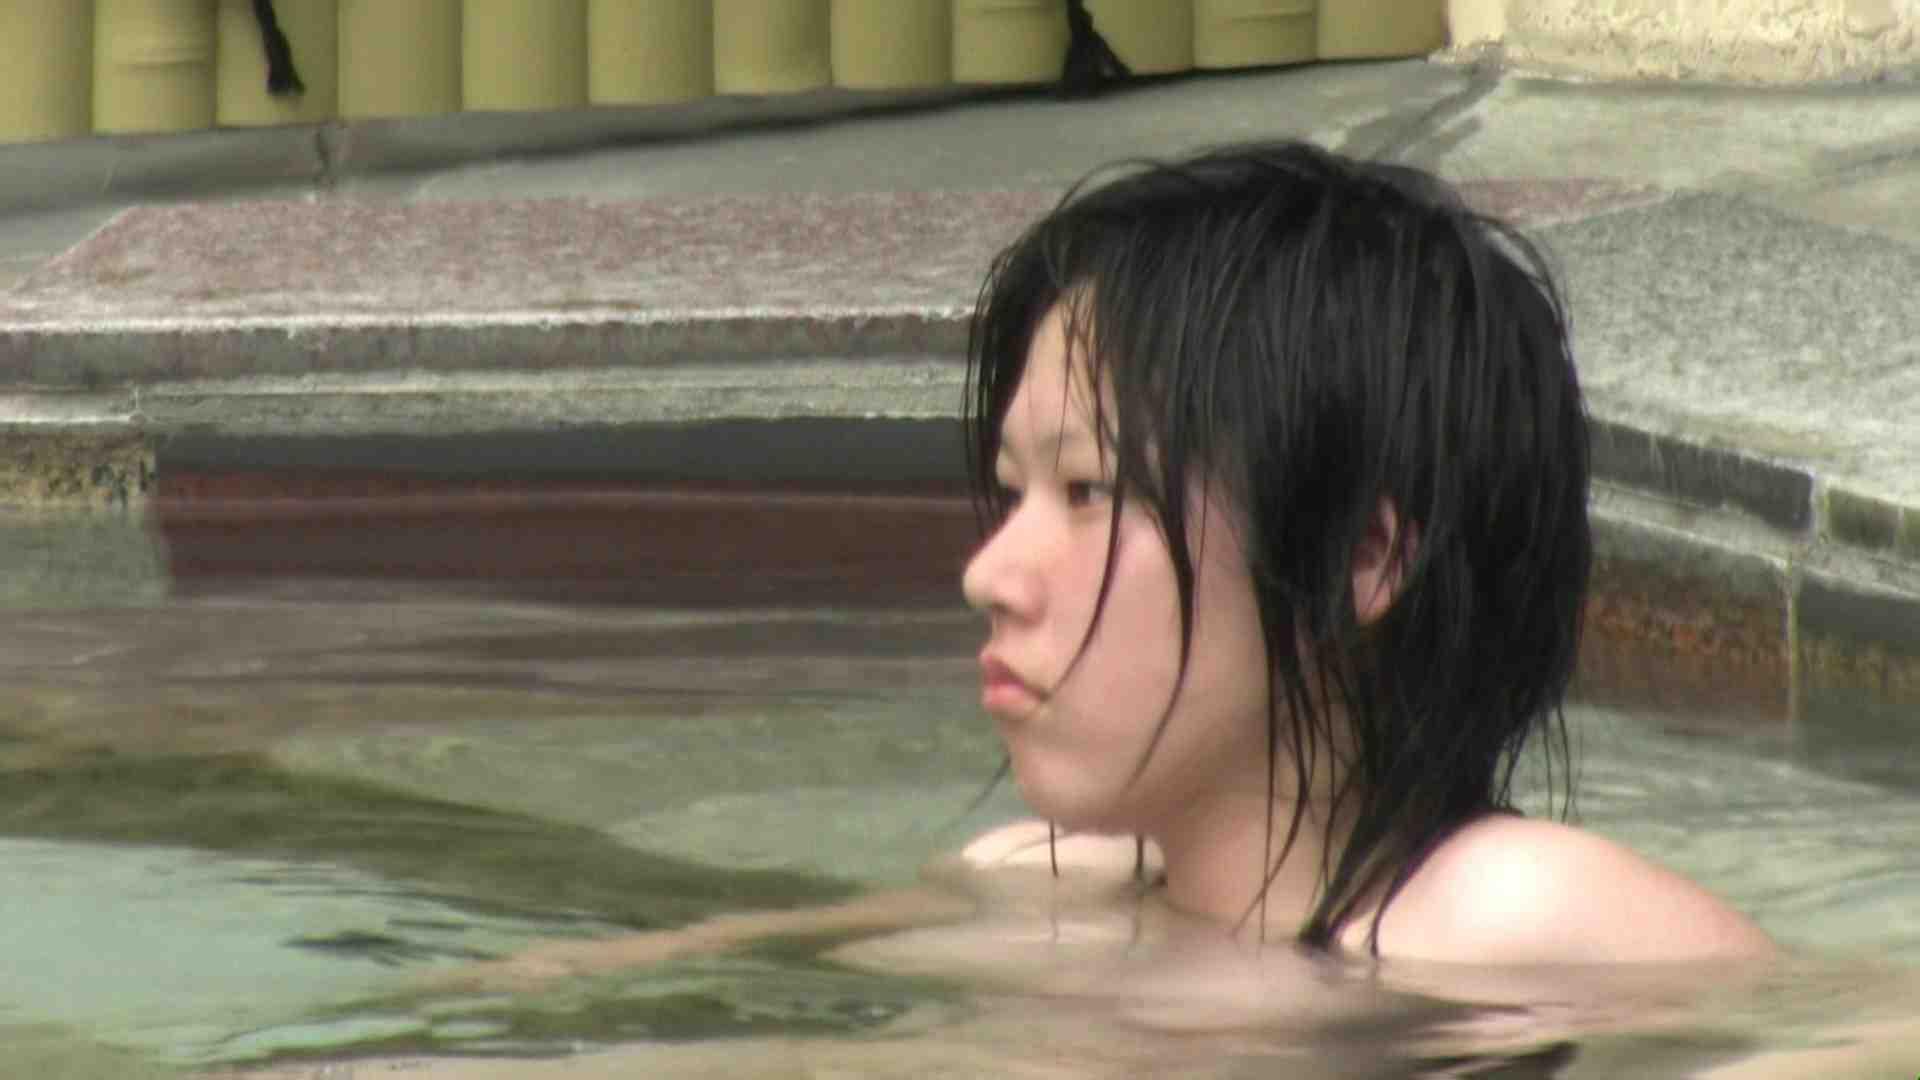 Aquaな露天風呂Vol.36 盗撮シリーズ   露天風呂編  99PIX 93